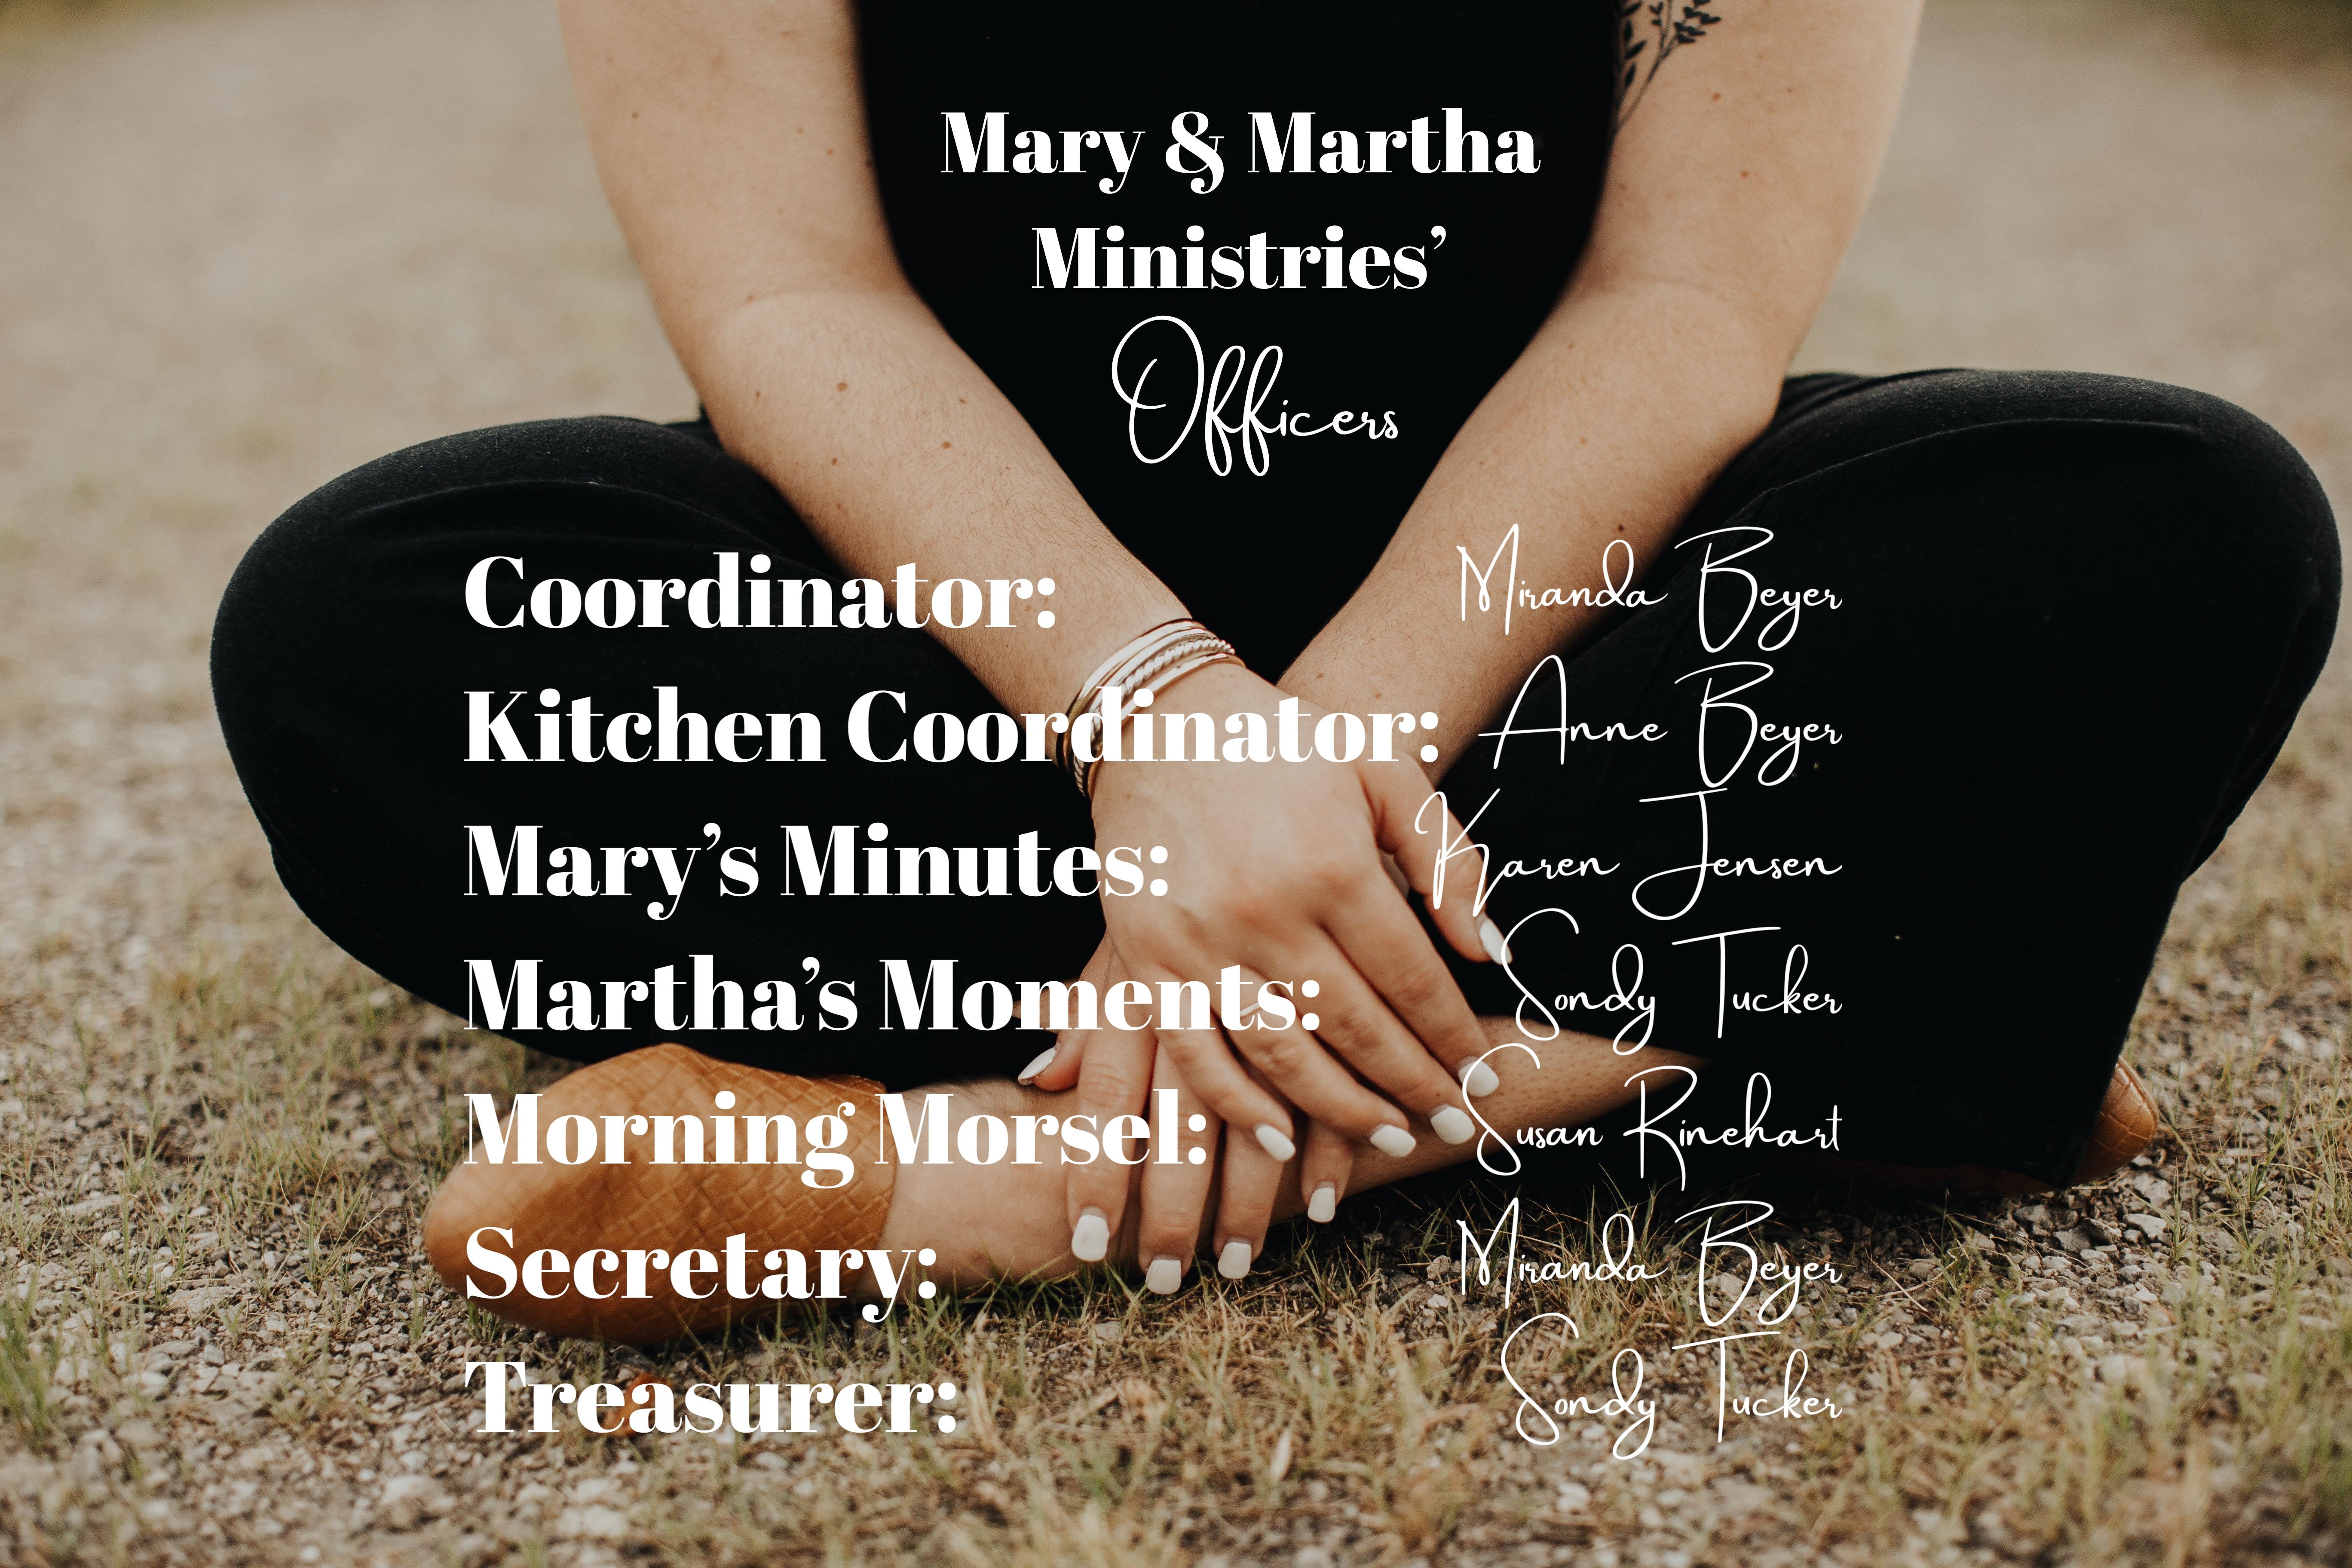 M&M Min Officers 2020